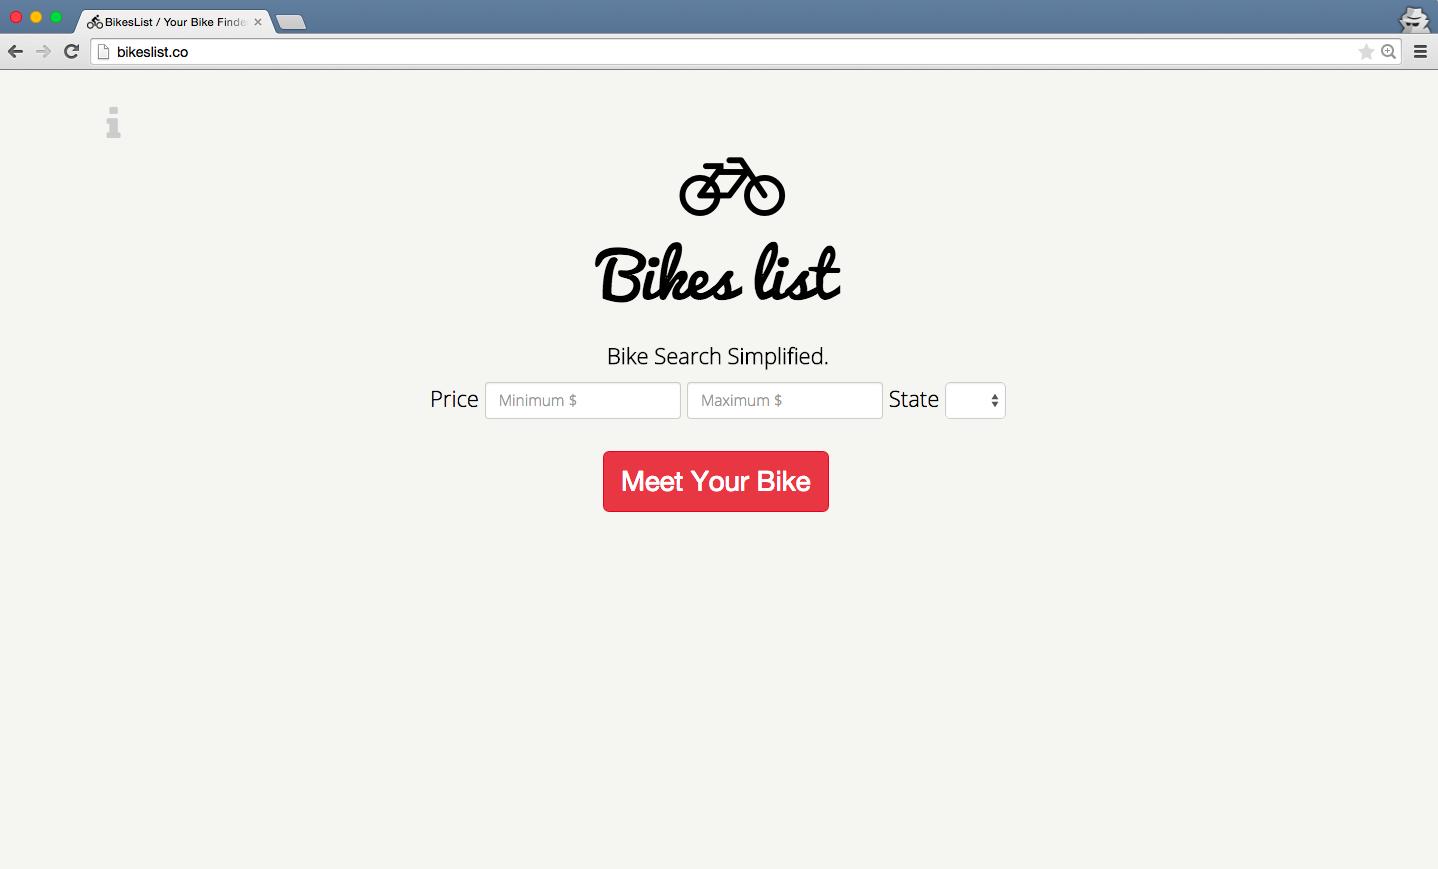 Biklist